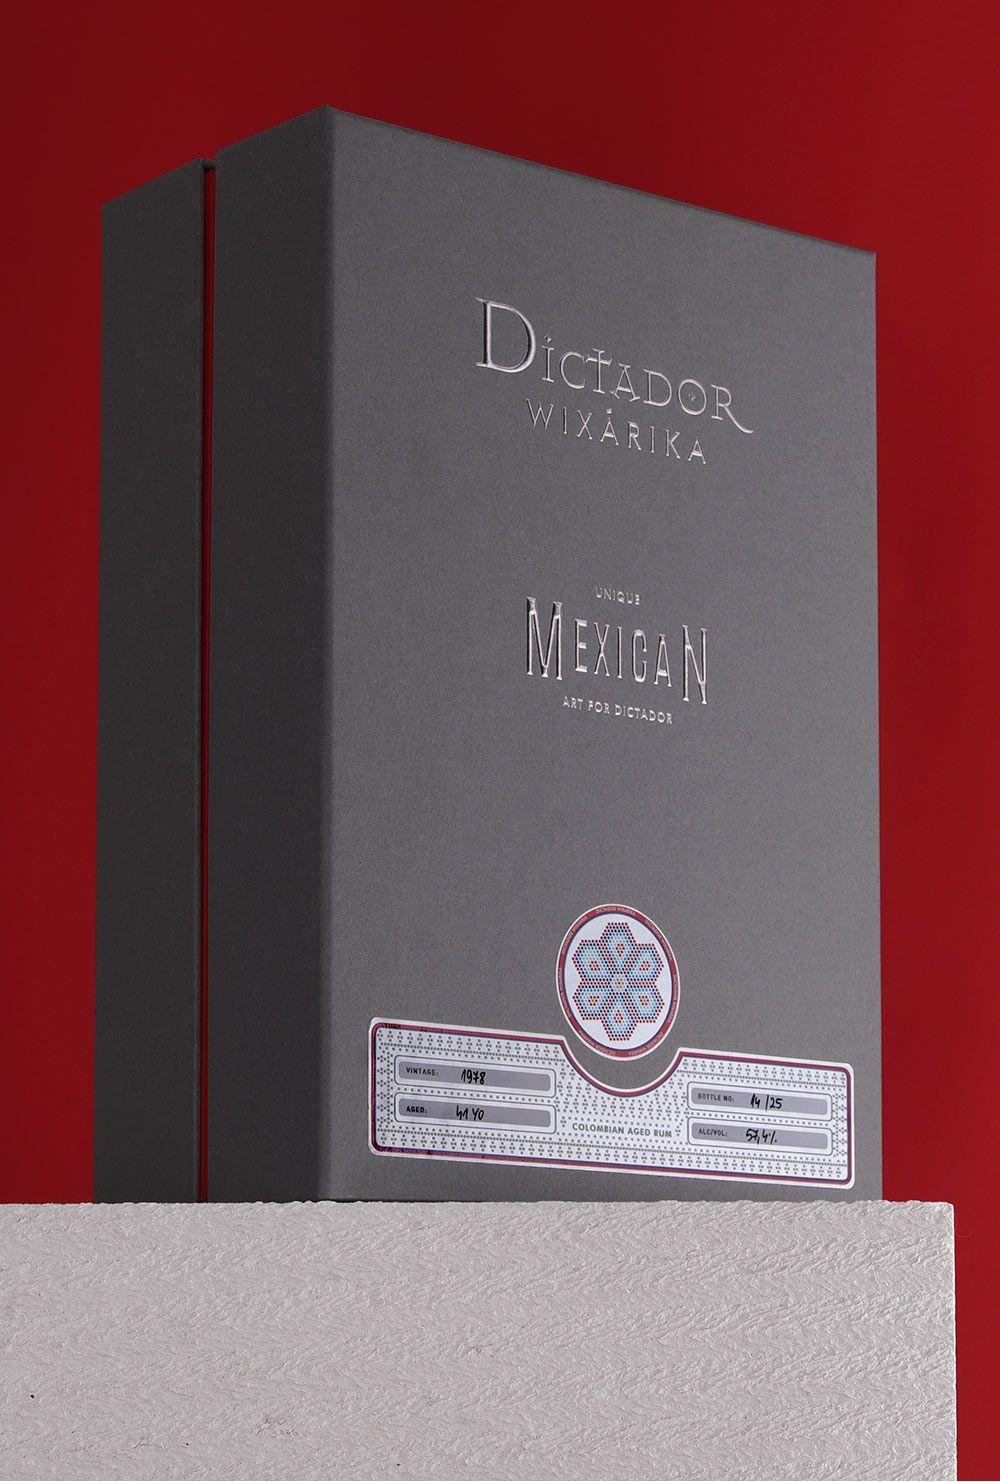 Dictador Wixarika | Model 2018/9